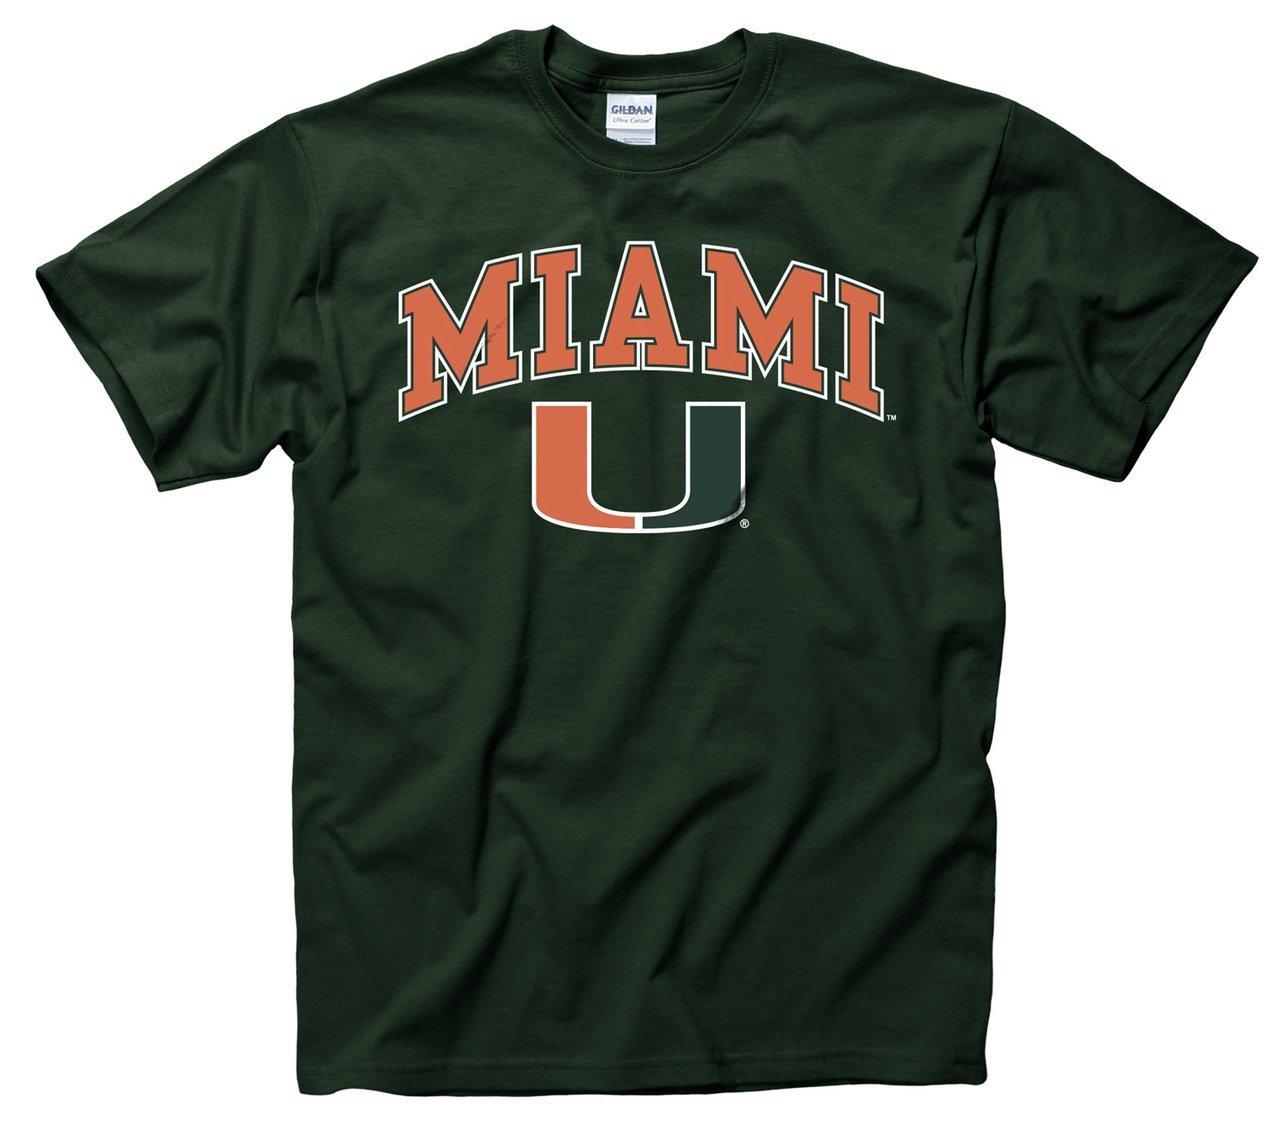 New hot 2017 Men Cotton Tshirts Miami Hurricanes Adult Arch & Logo Gameday T-Shirt - Green Size S-XXXL(China (Mainland))